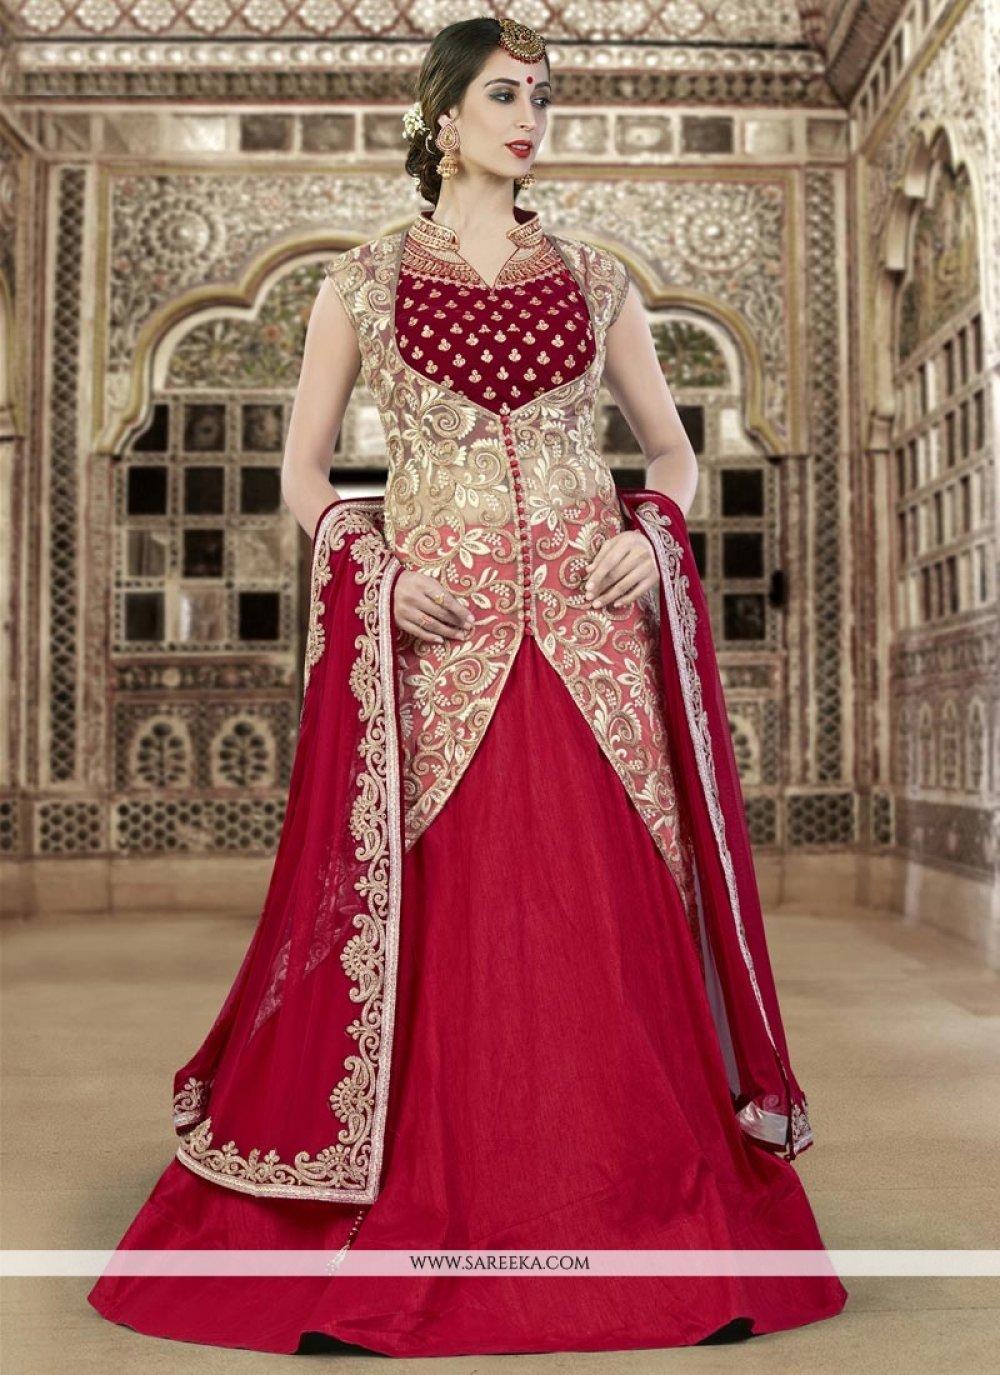 Resham Work Raw Silk A Line Lehenga Choli